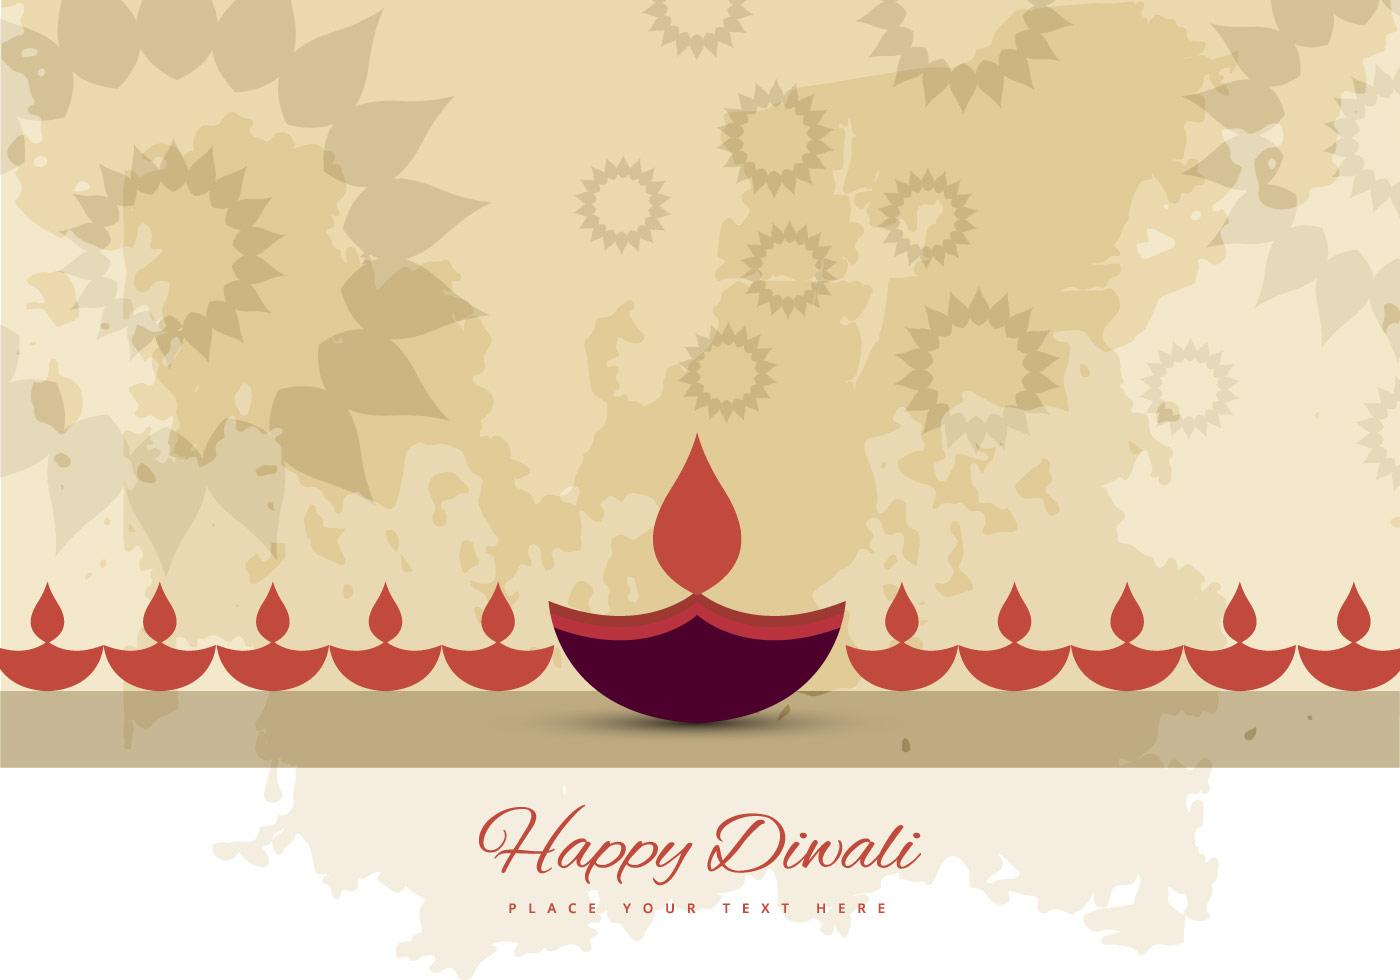 Greeting Card For Hindu Festival Diwali Download Free Vector Art